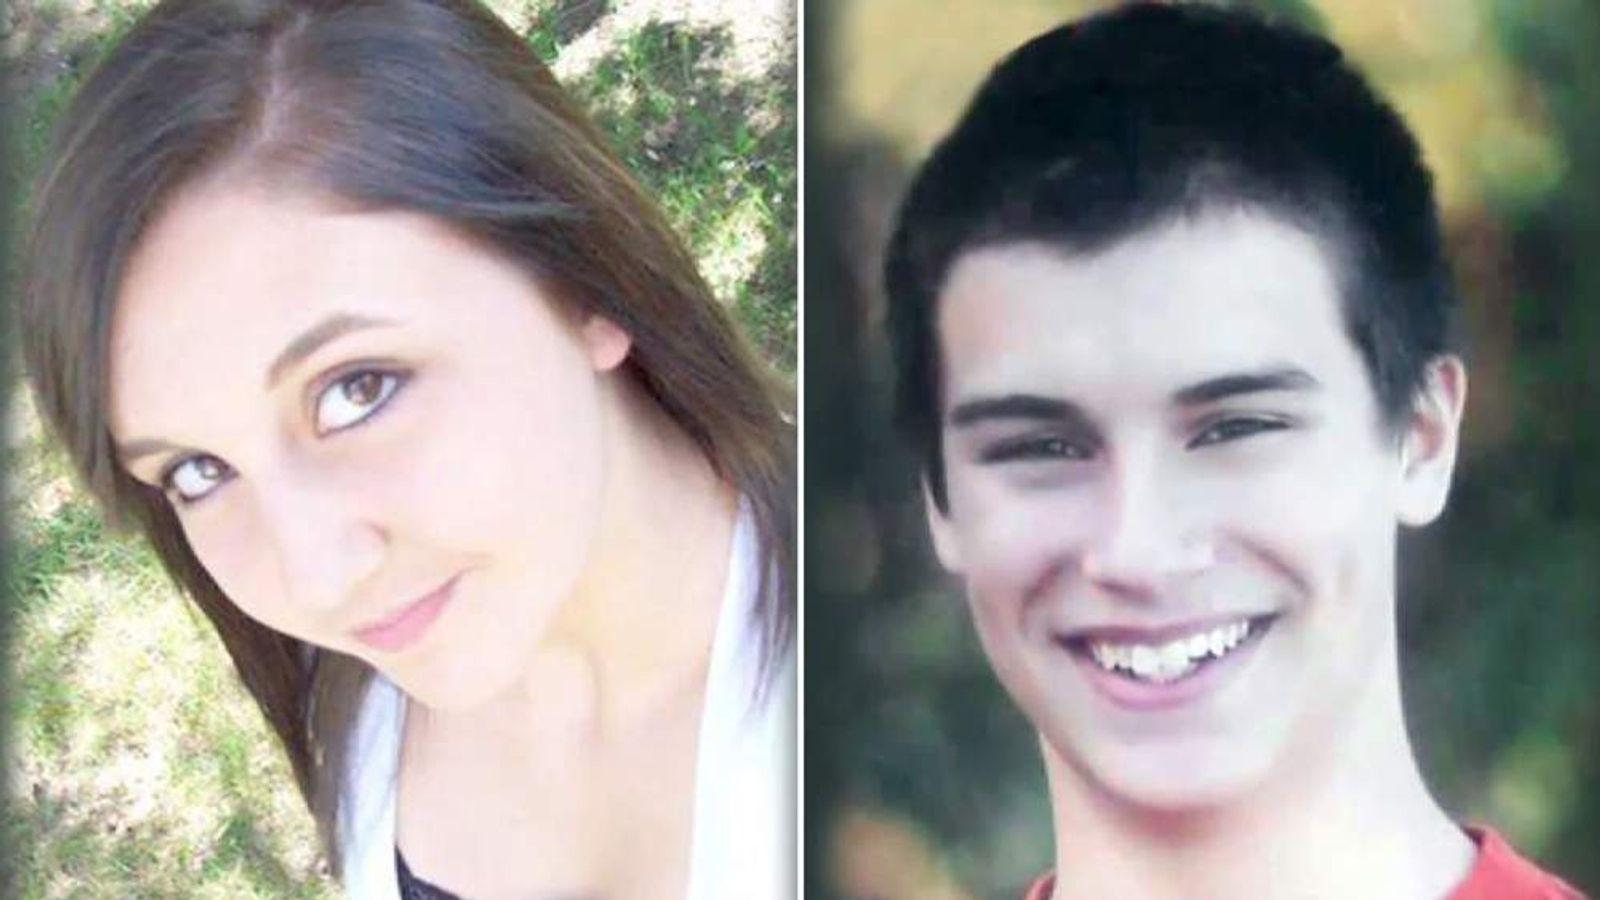 Teens Haile Kifer and Nick Brady. Pics: CBS